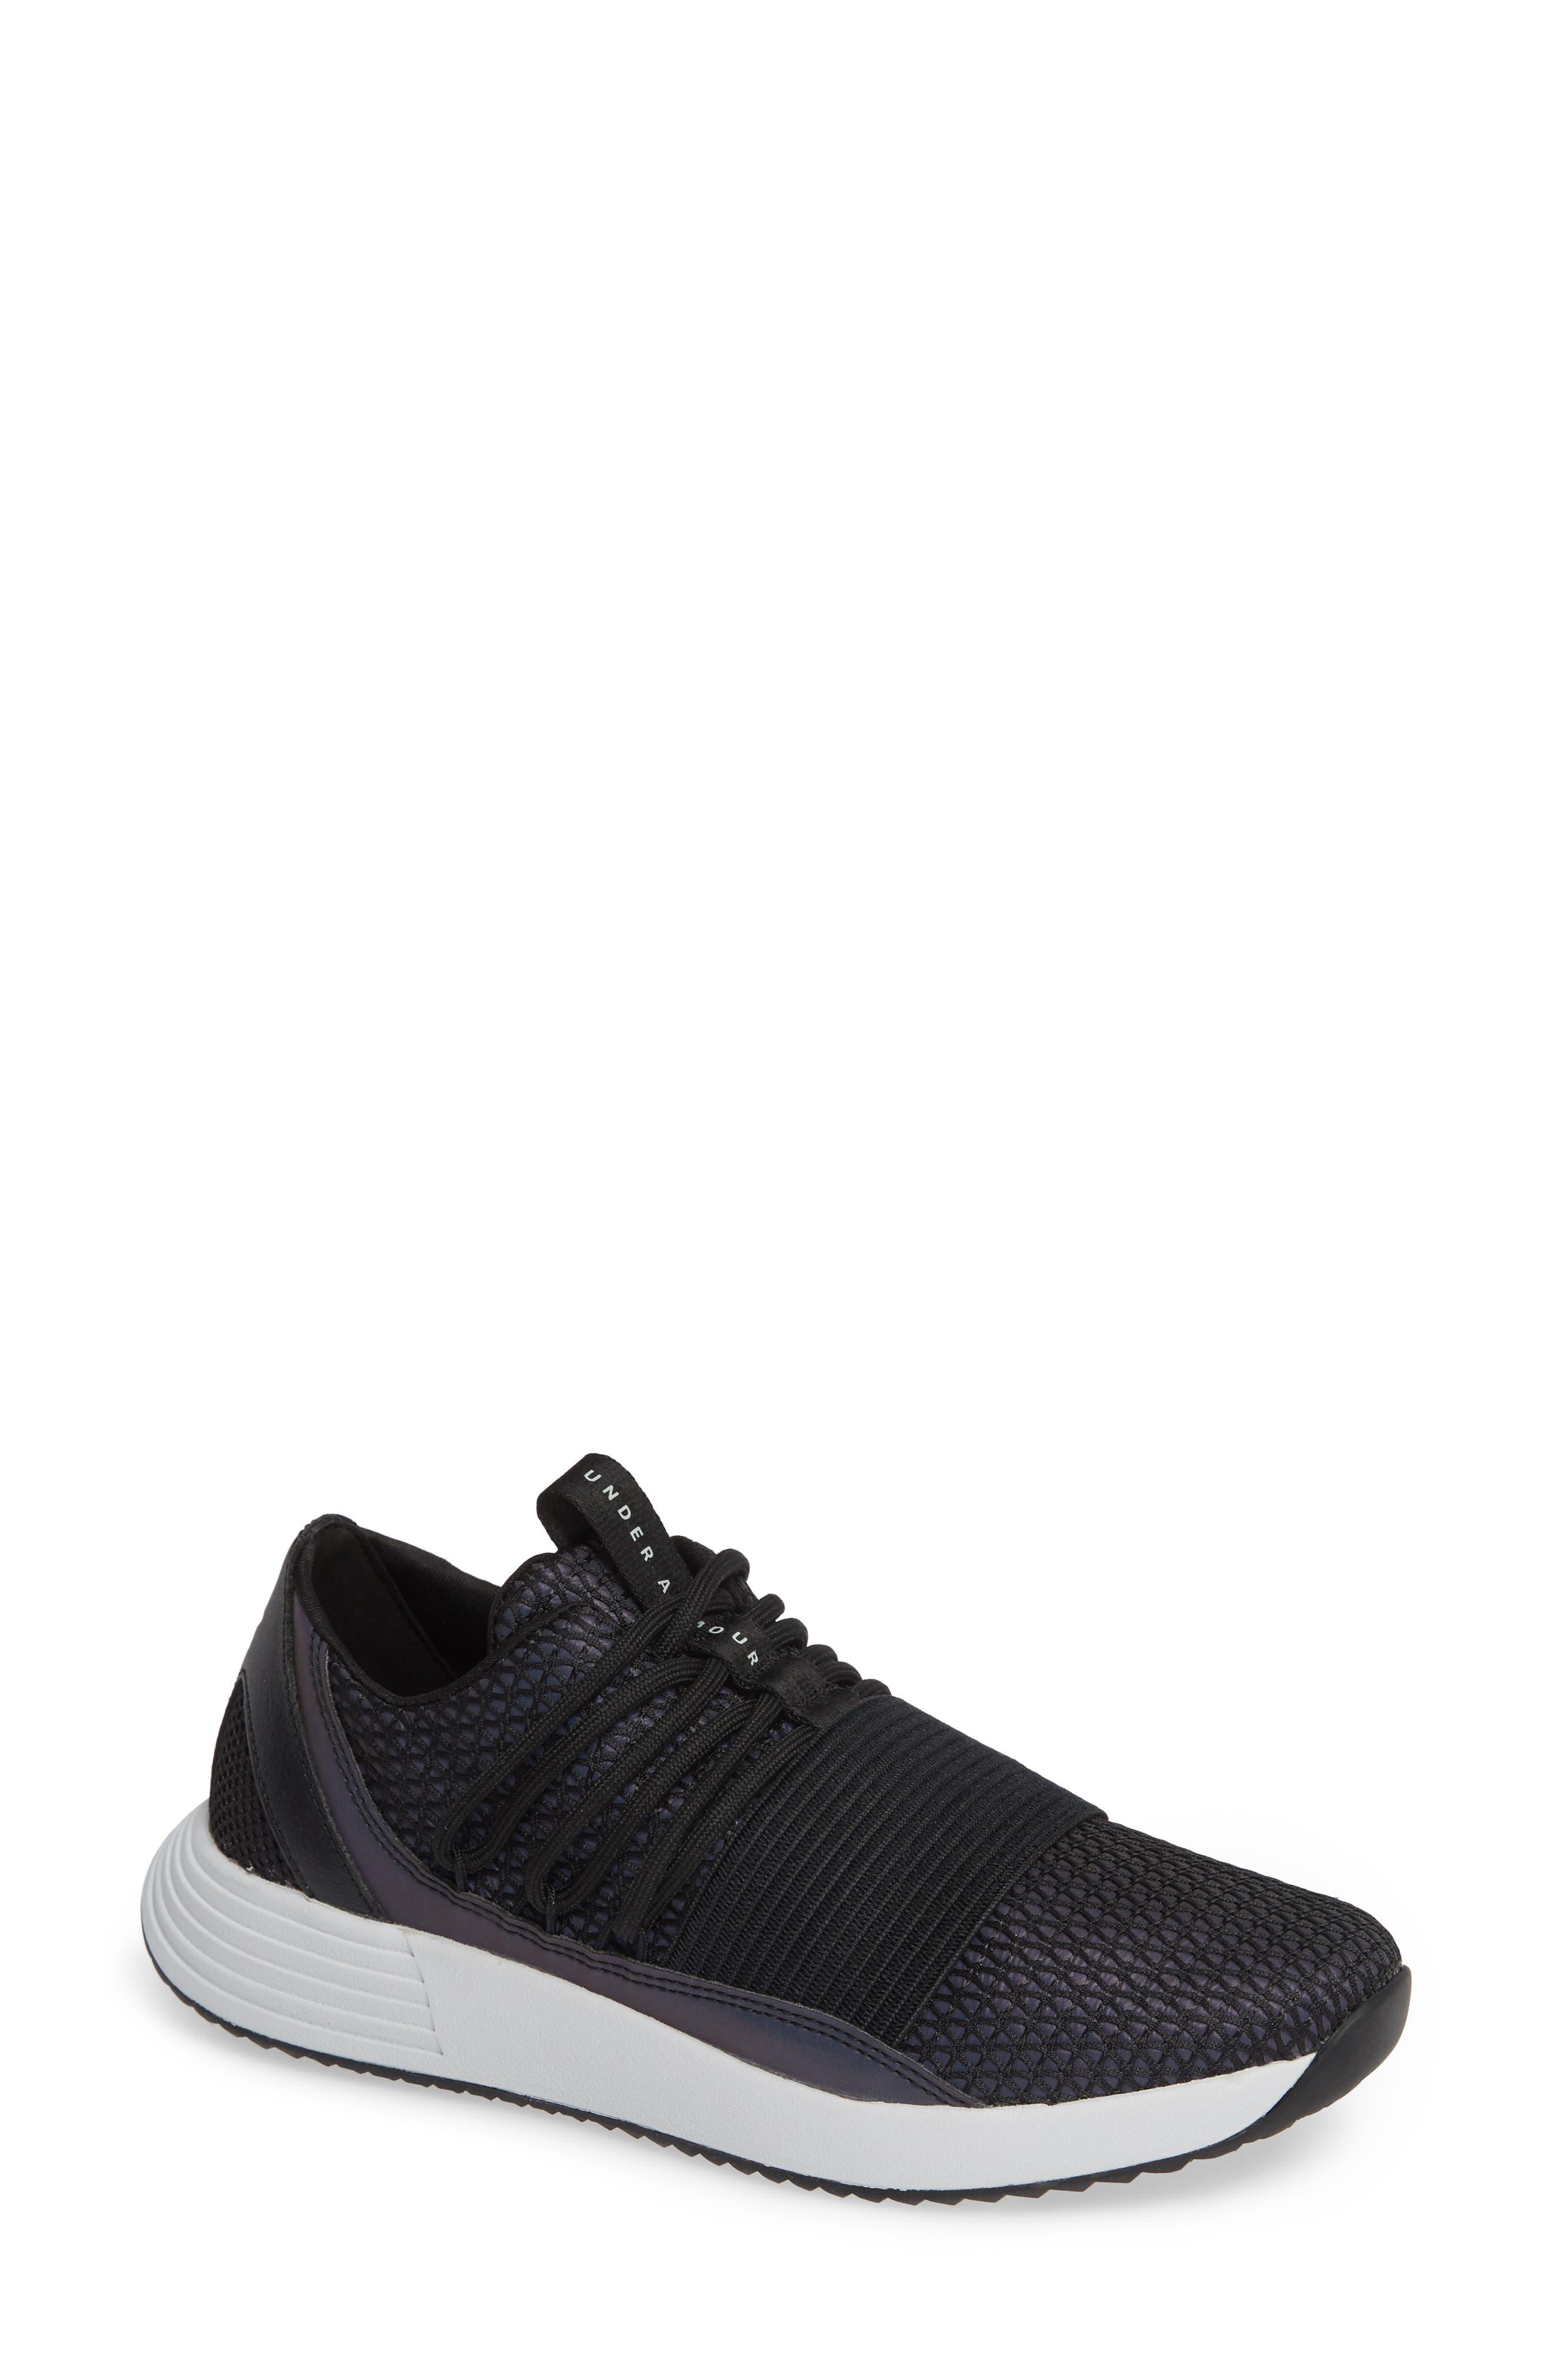 Breathe Reflective Low Top Sneaker,                         Main,                         color, BLACK/ BLACK/ BLACK